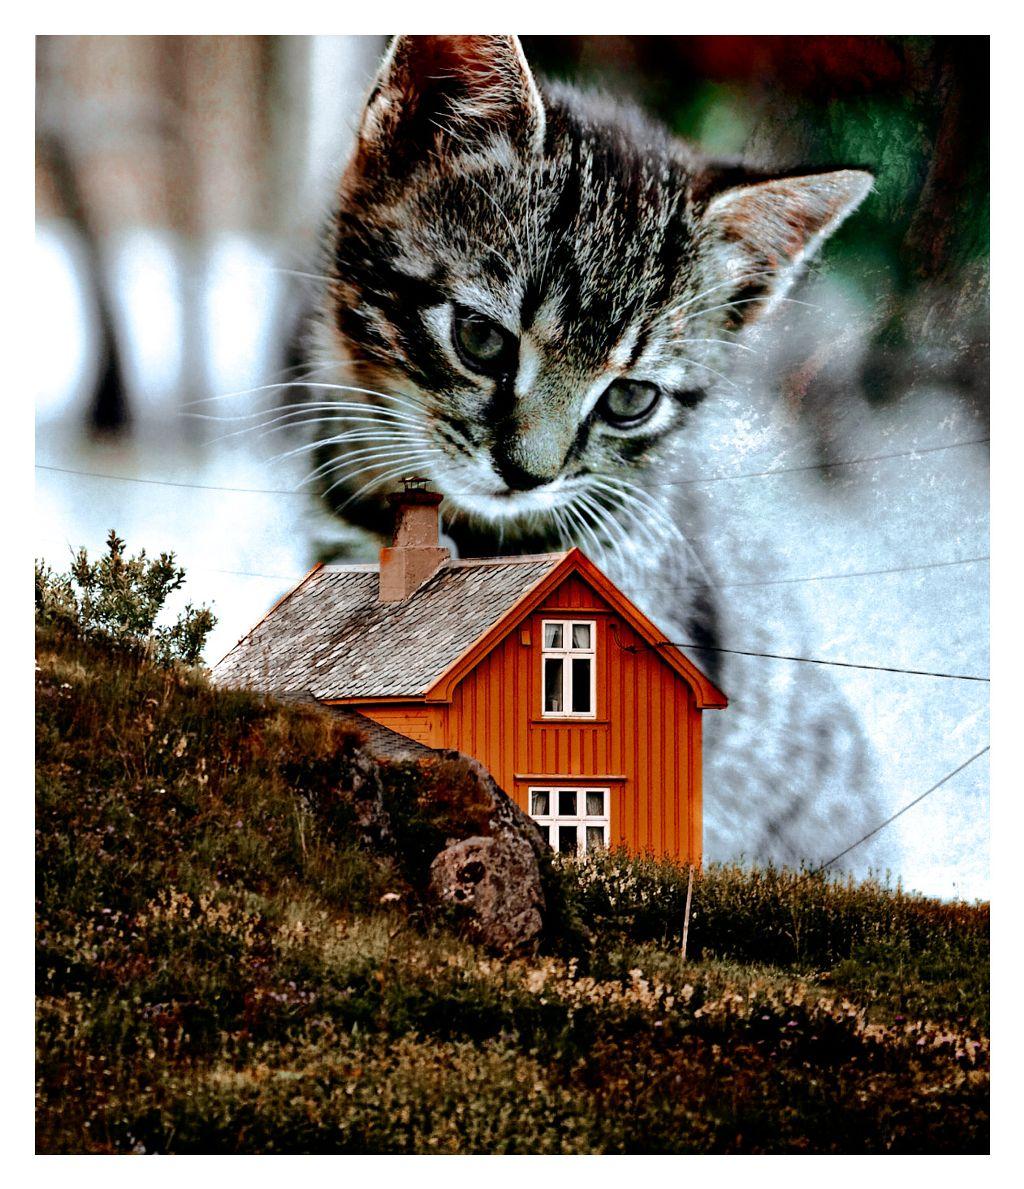 #freetoedit #home #kitten #love #lovely #cute #animal #nature #morning #spring  🌾